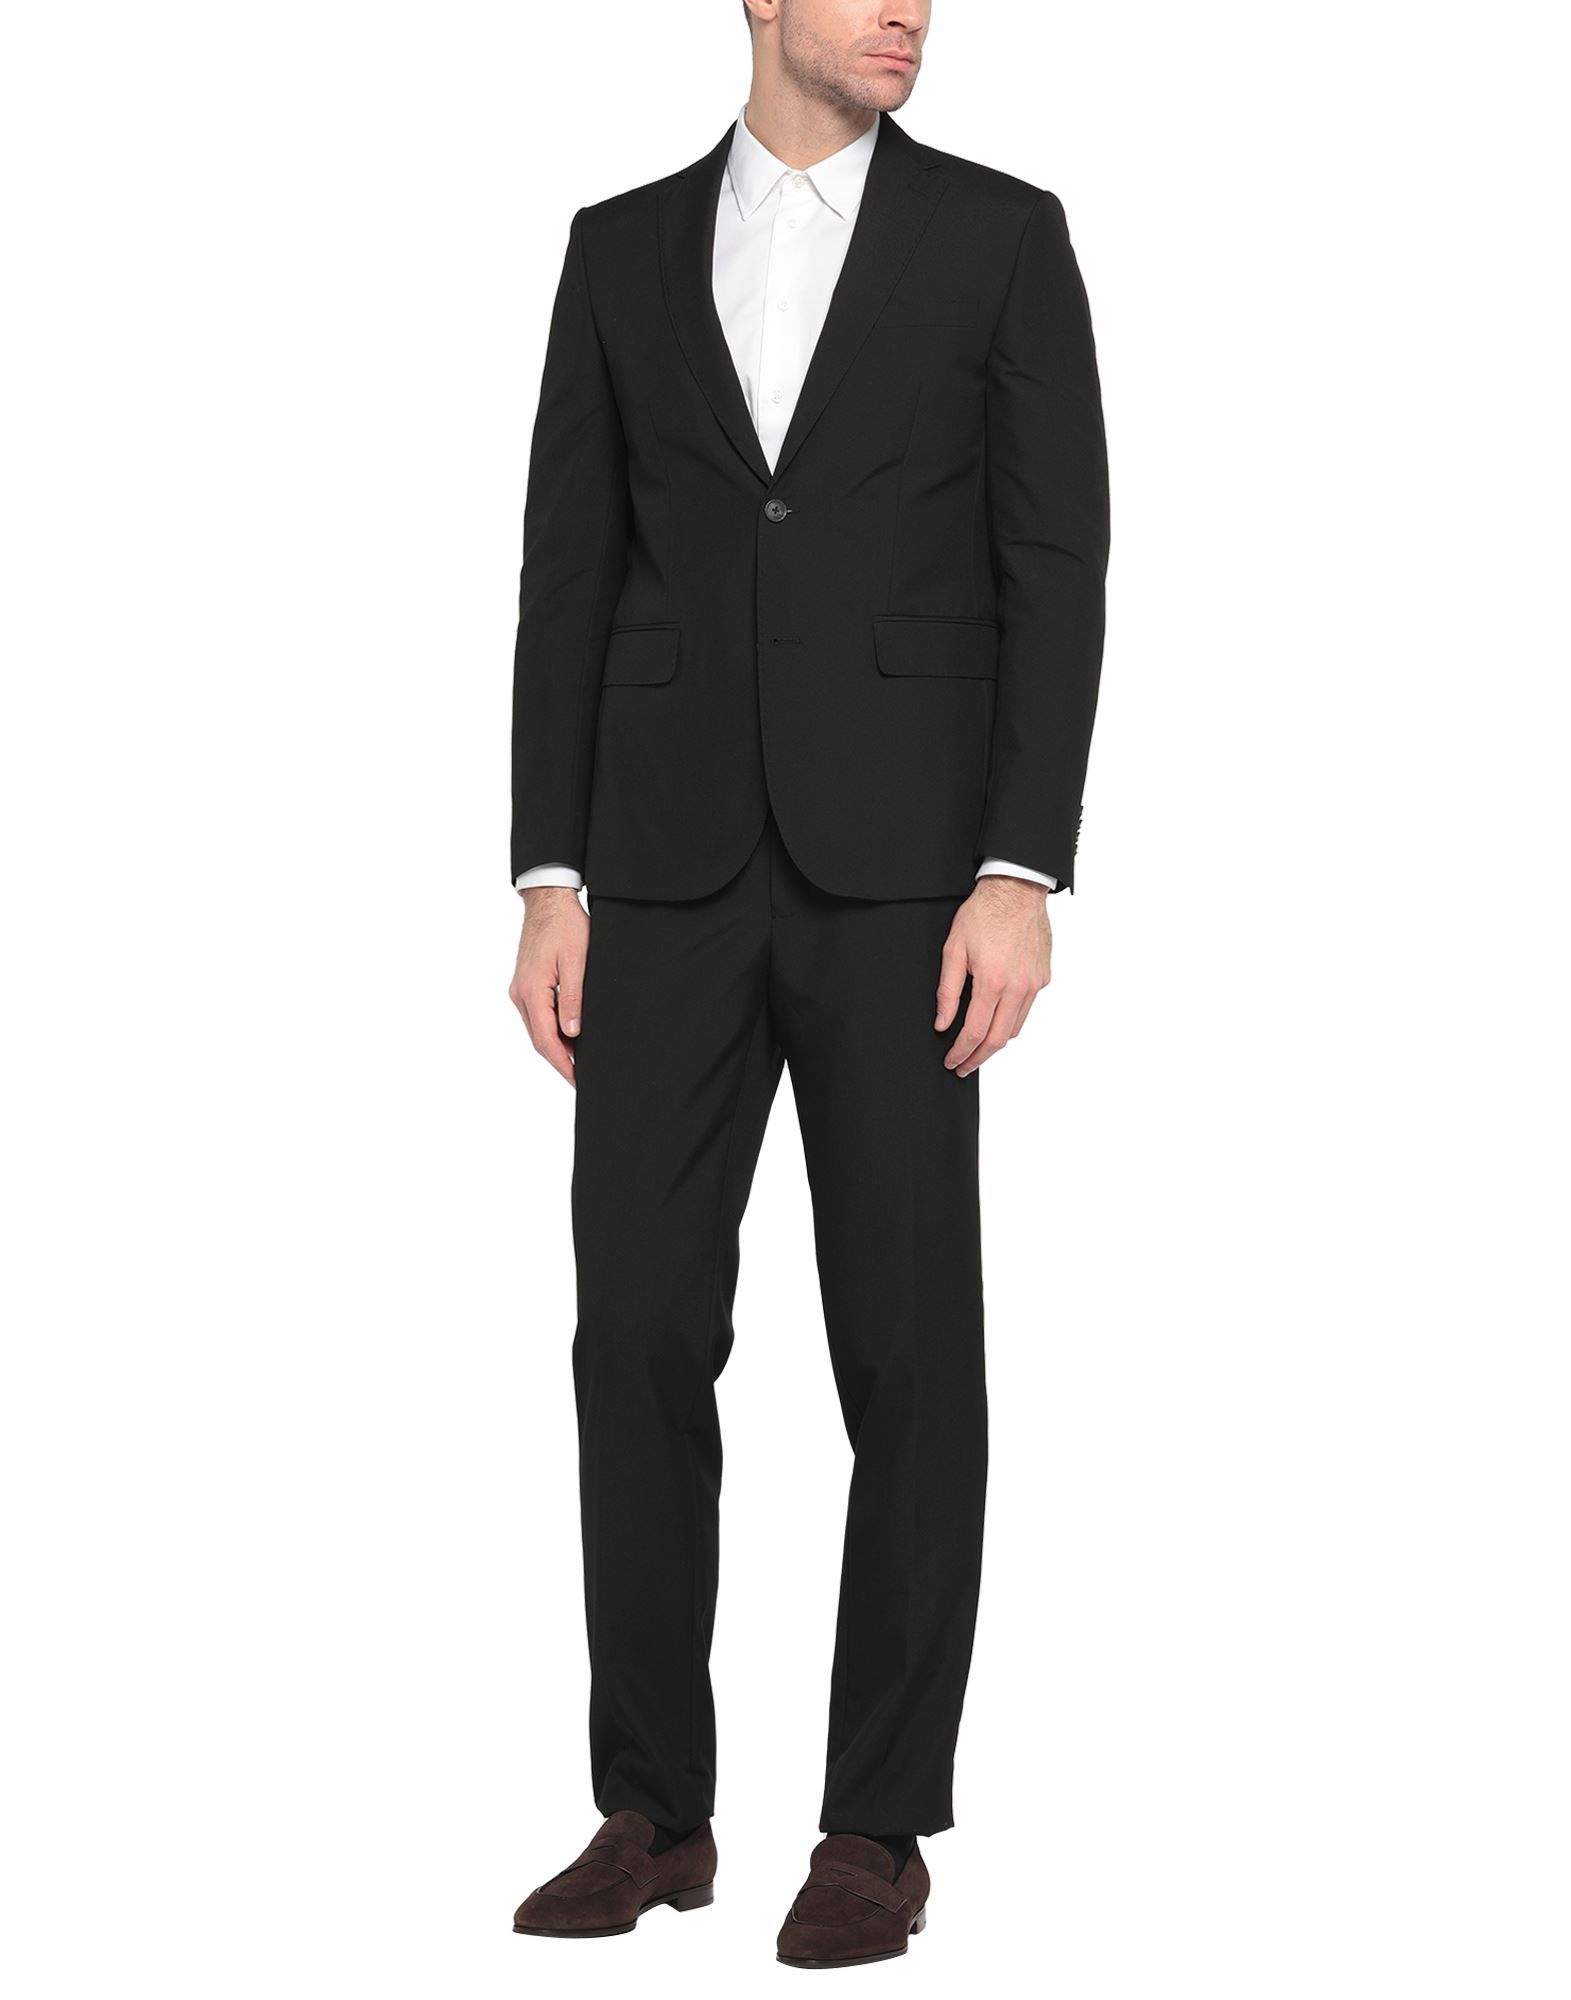 HERMAN & SONS Suits - Item 49649001